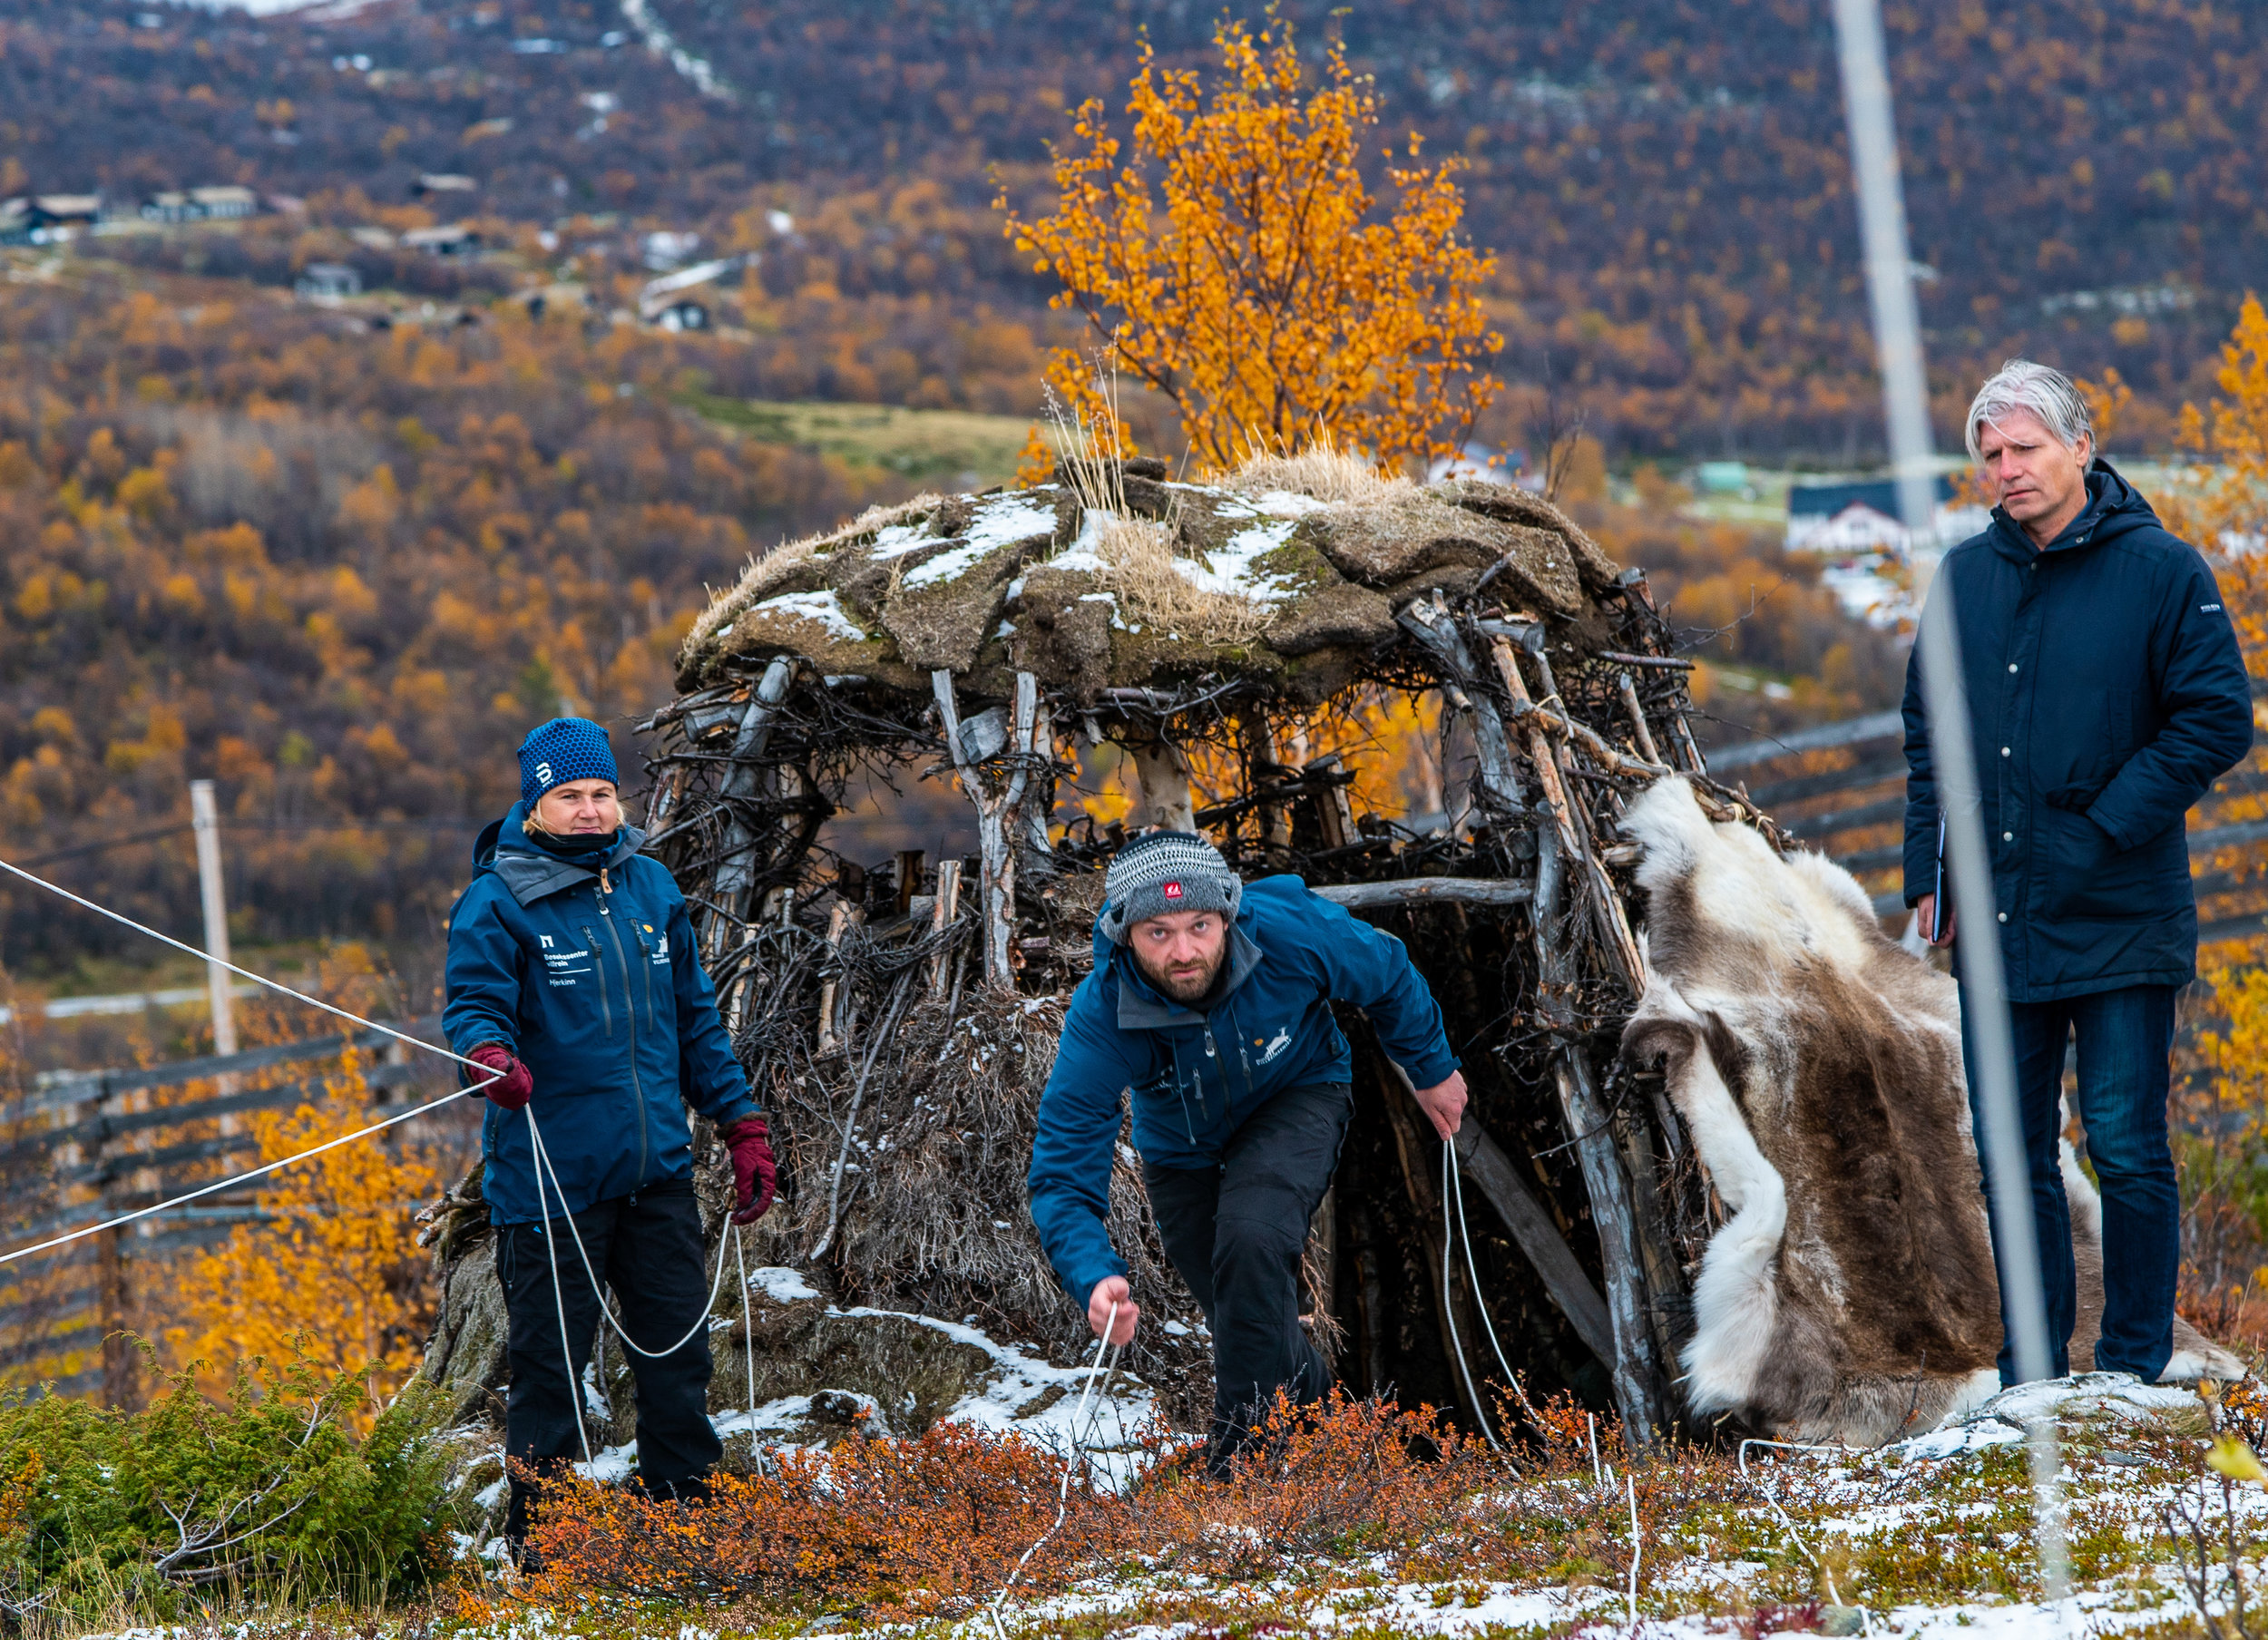 Naturvegleiarane Heidi Vognild (t.v.) og Are Endal Rognes demonstrerer falkefangst for klima- og miljøminister Ola Elvestuen (t.h.). Foto: Rebecca Nedregotten Strand